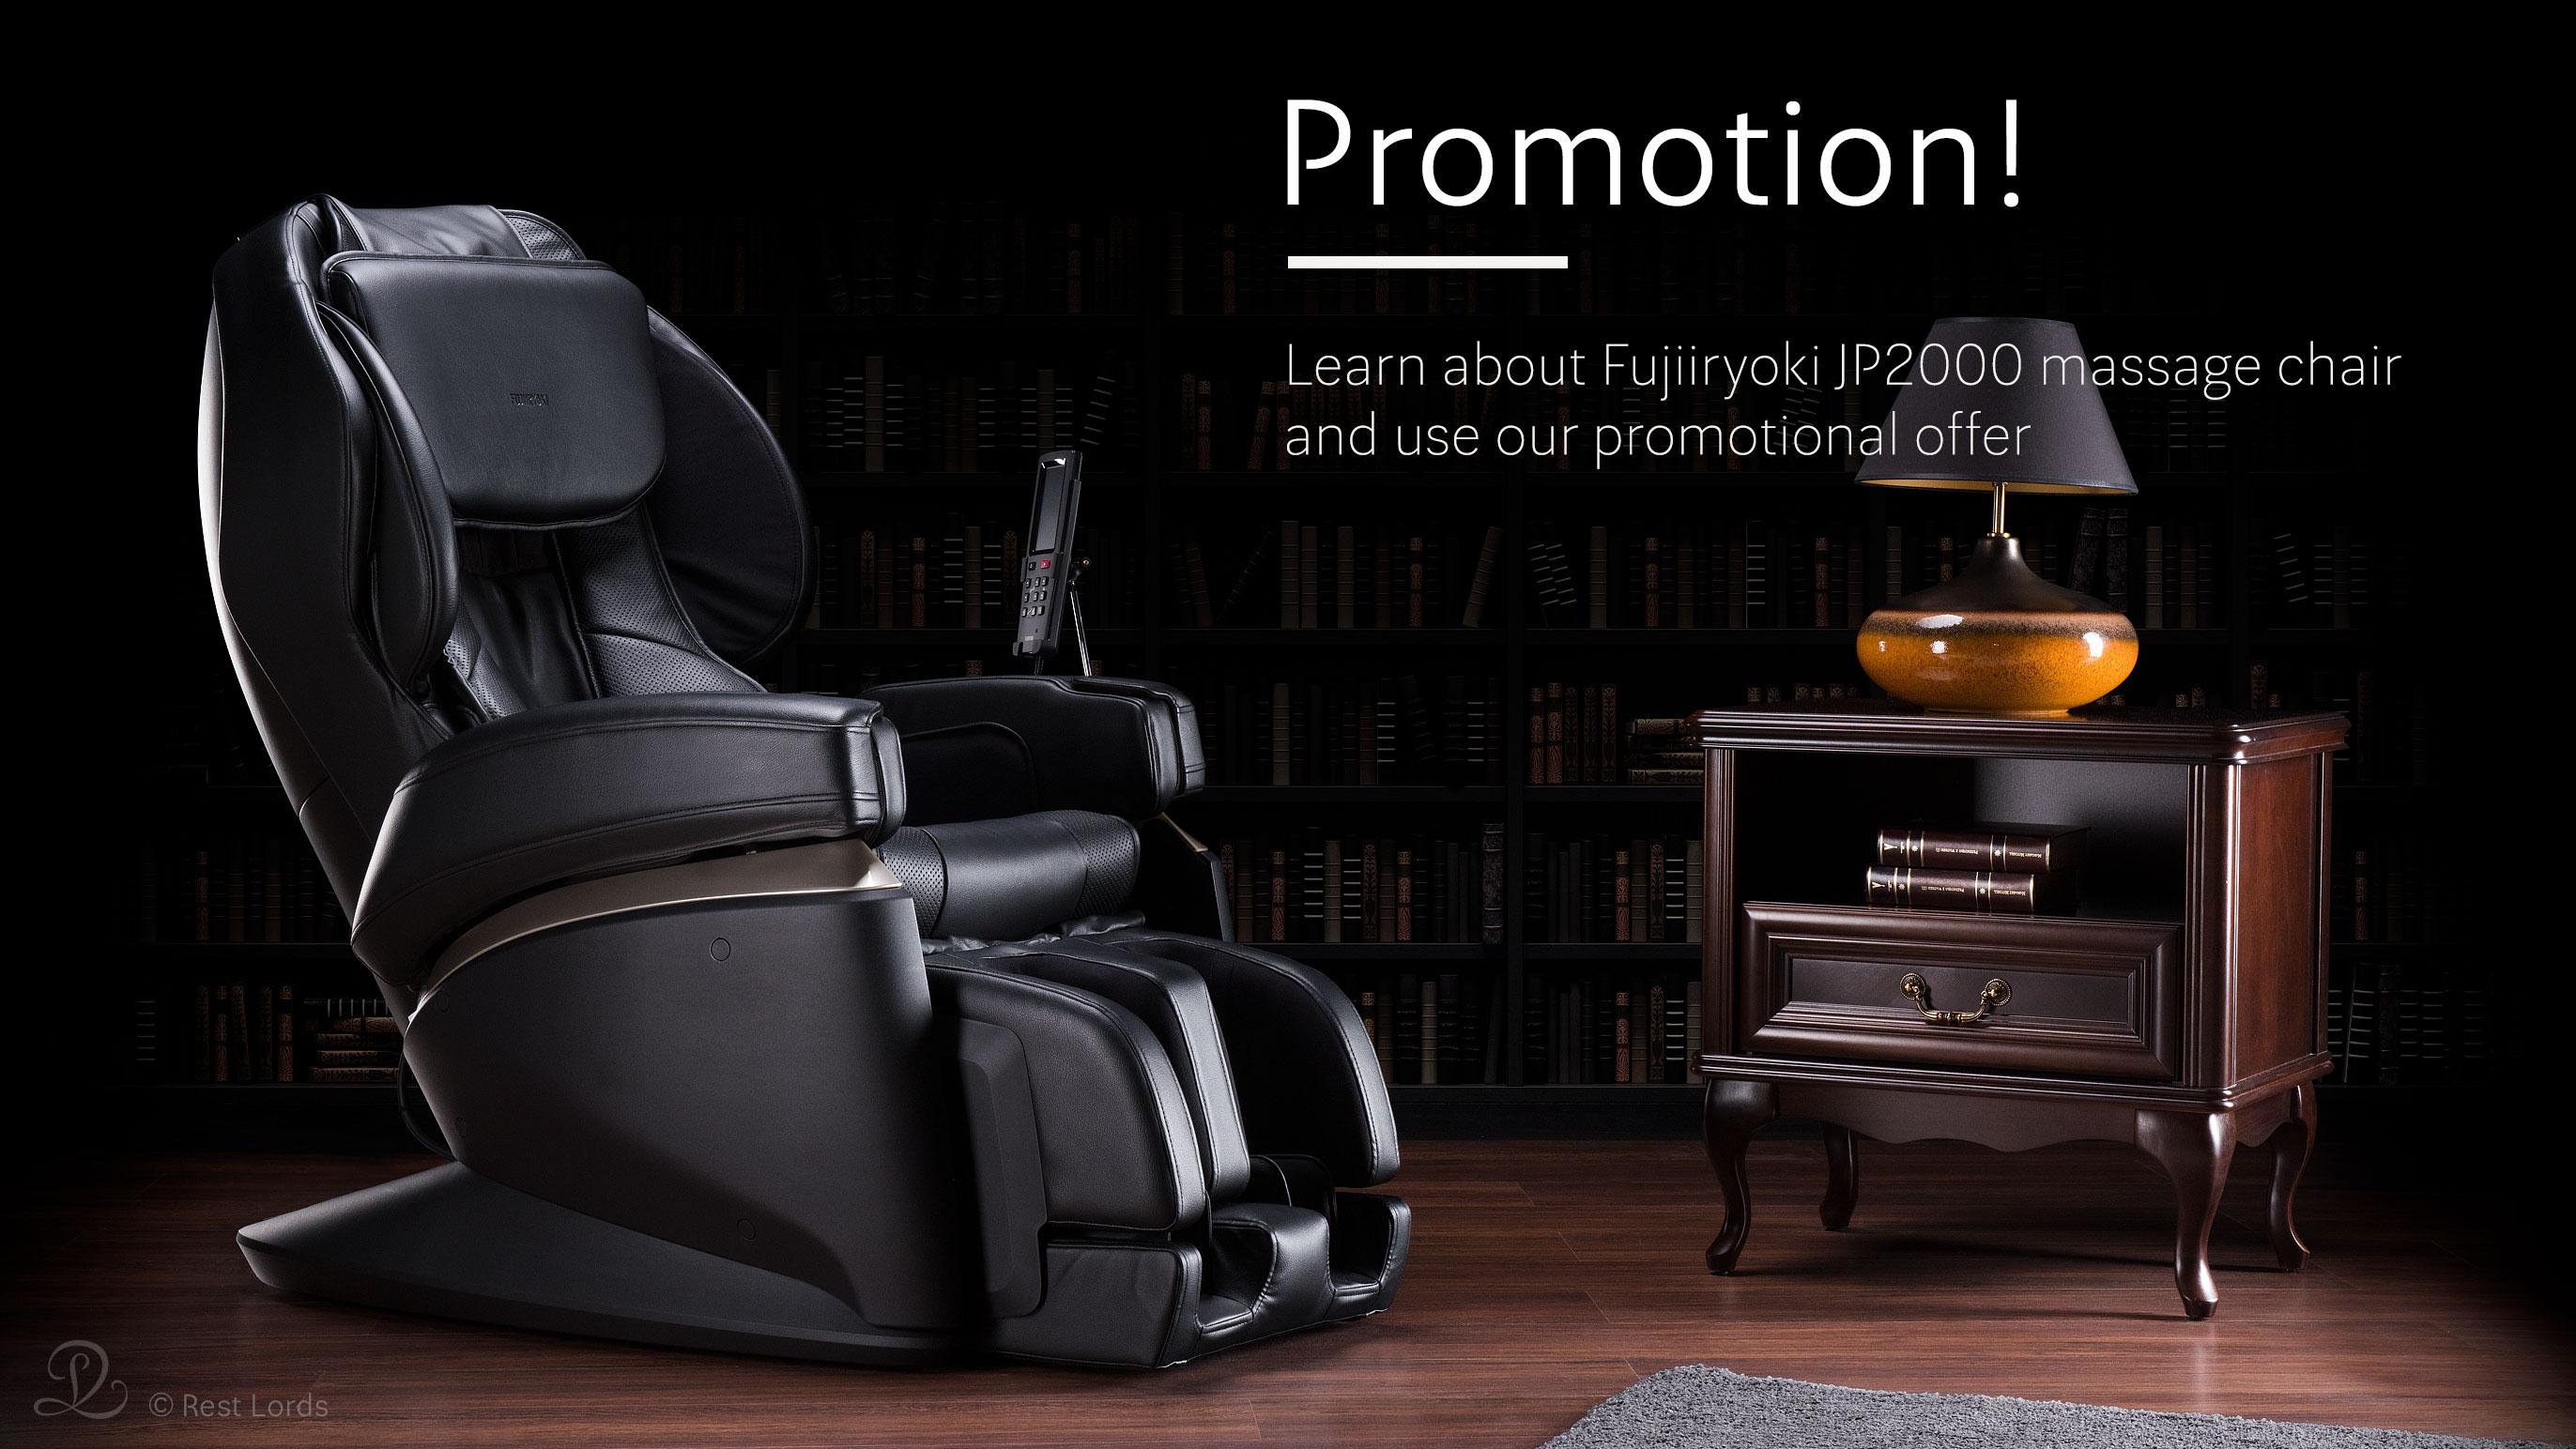 Massage chair Fujiiryoki jP2000 on sale promotion